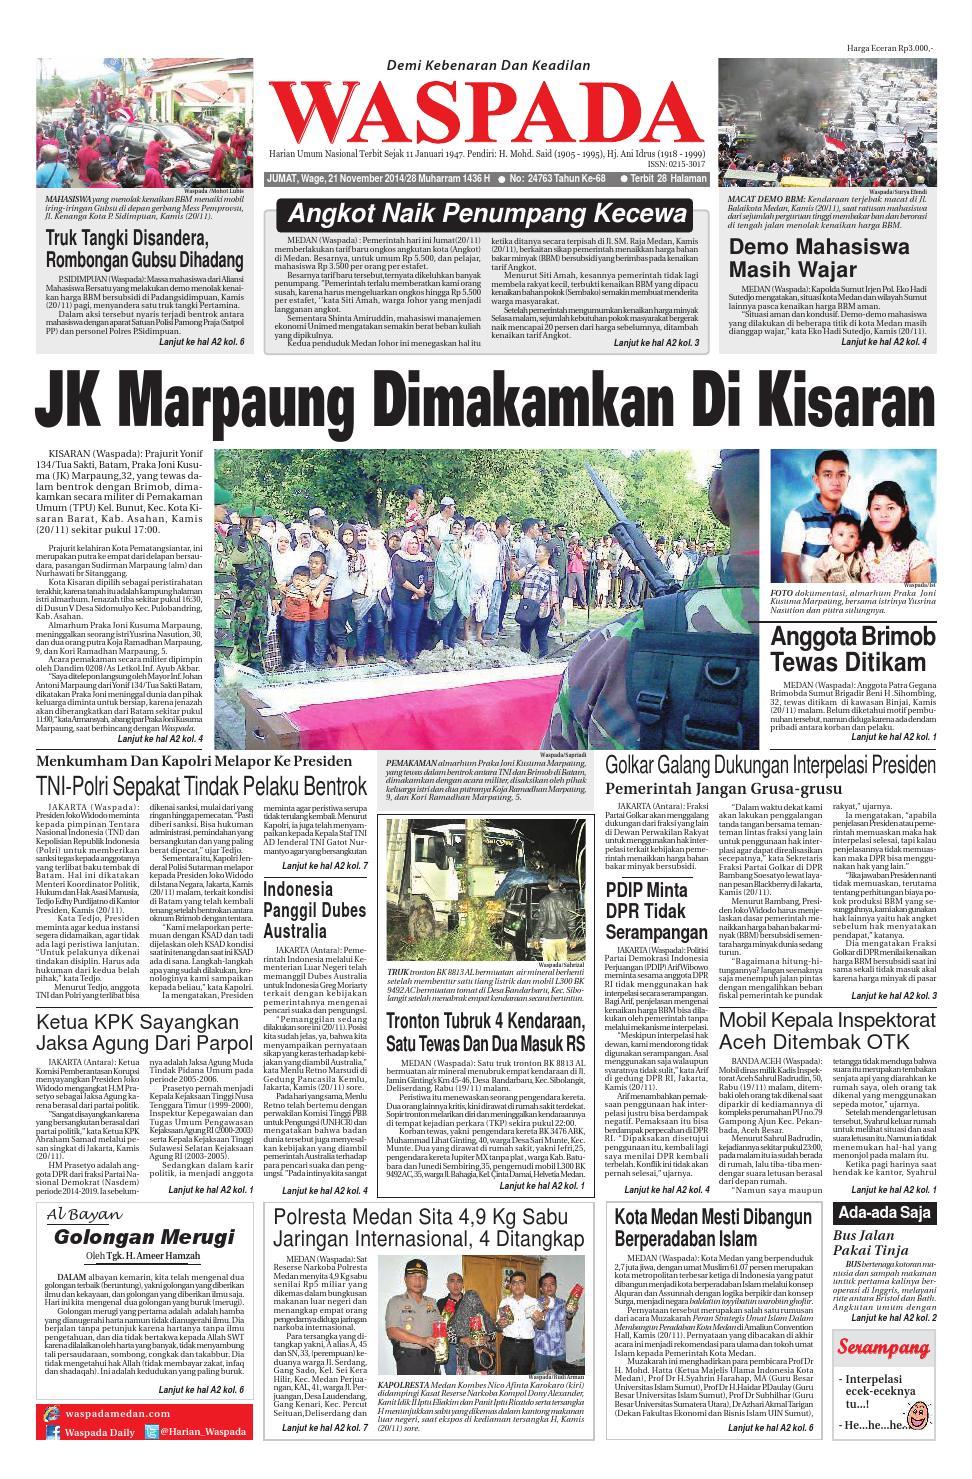 Waspadajumat 21 November 2014 By Harian Waspada Issuu Produk Ukm Bumn Madu Super Az Zikra